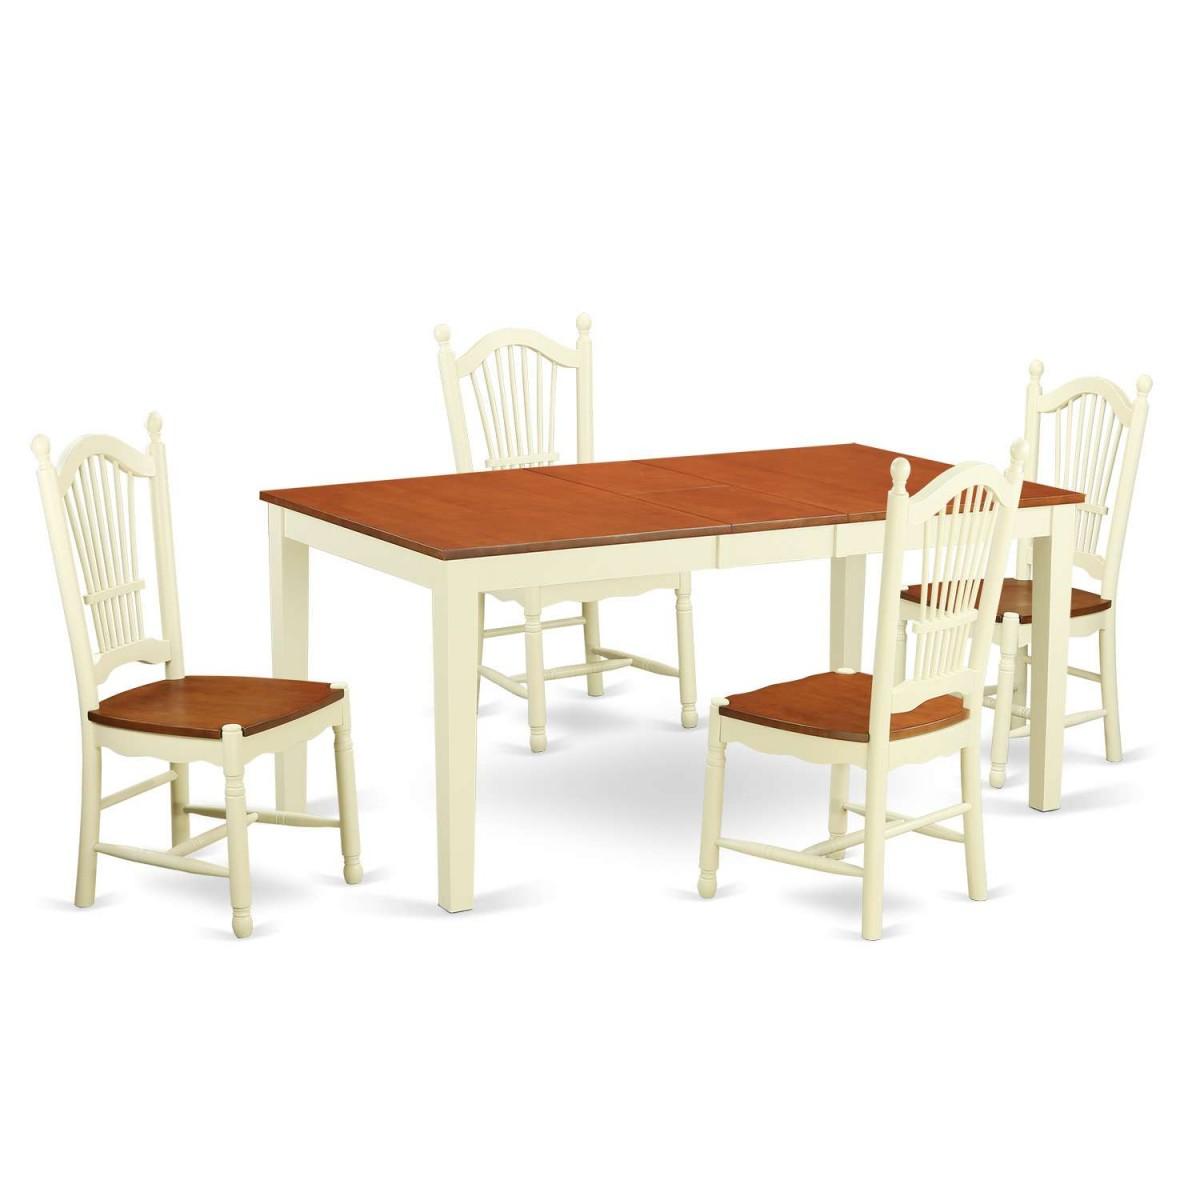 East West Nicoli 6 Piece Dining Set: East West Furniture Nicoli 5 Piece Dining Table Set